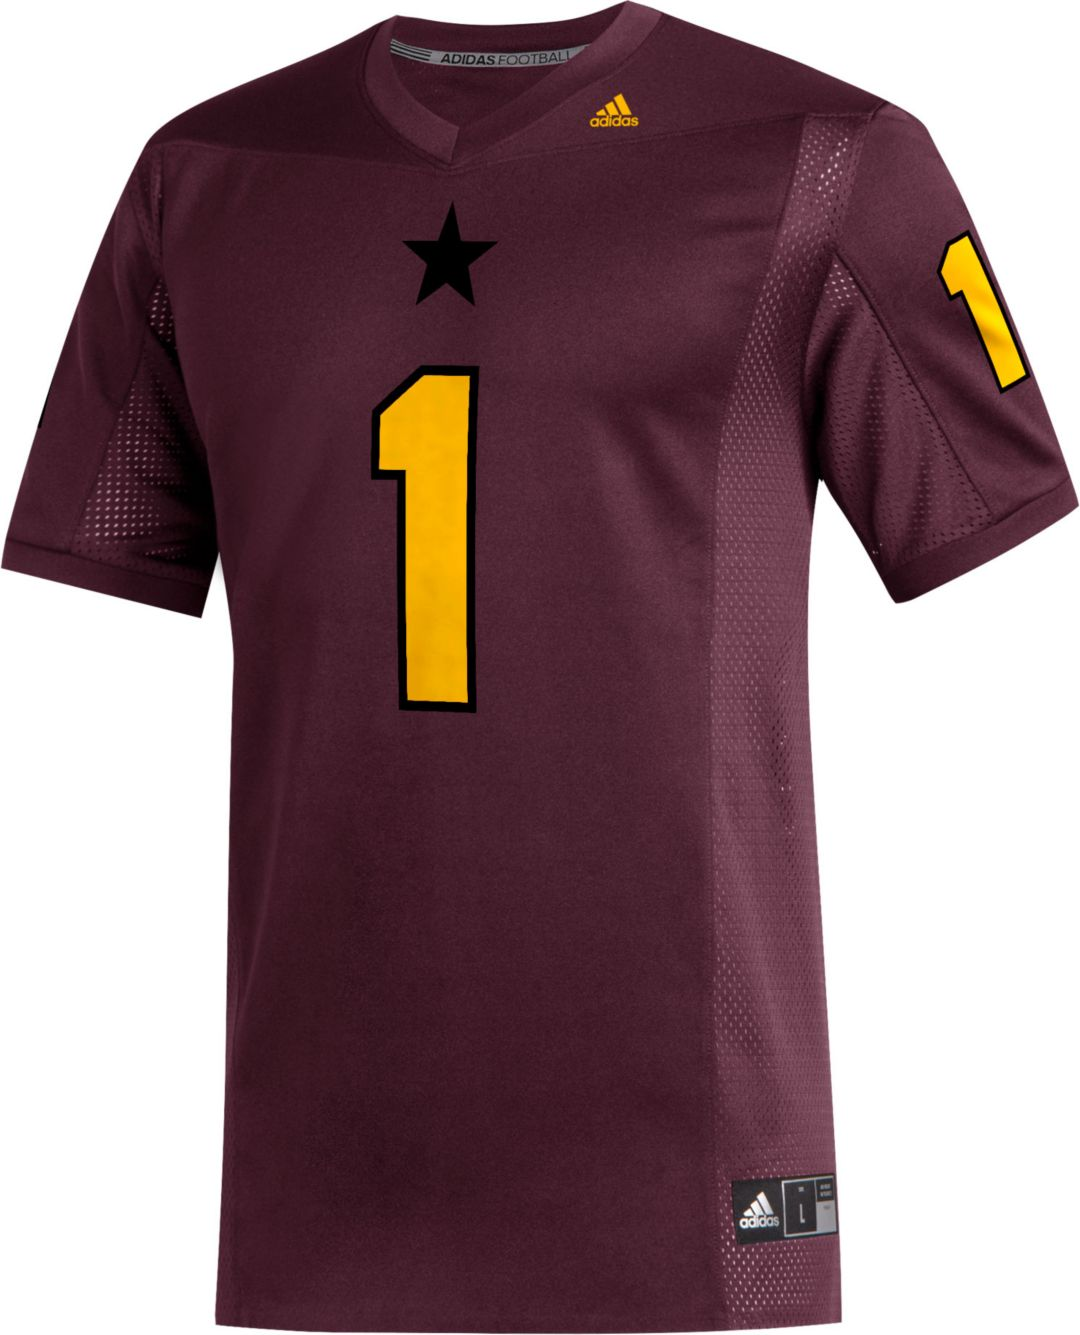 bdf18514 adidas Men's N'Keal Harry Arizona State Sun Devils Maroon #1 Replica  Football Jersey